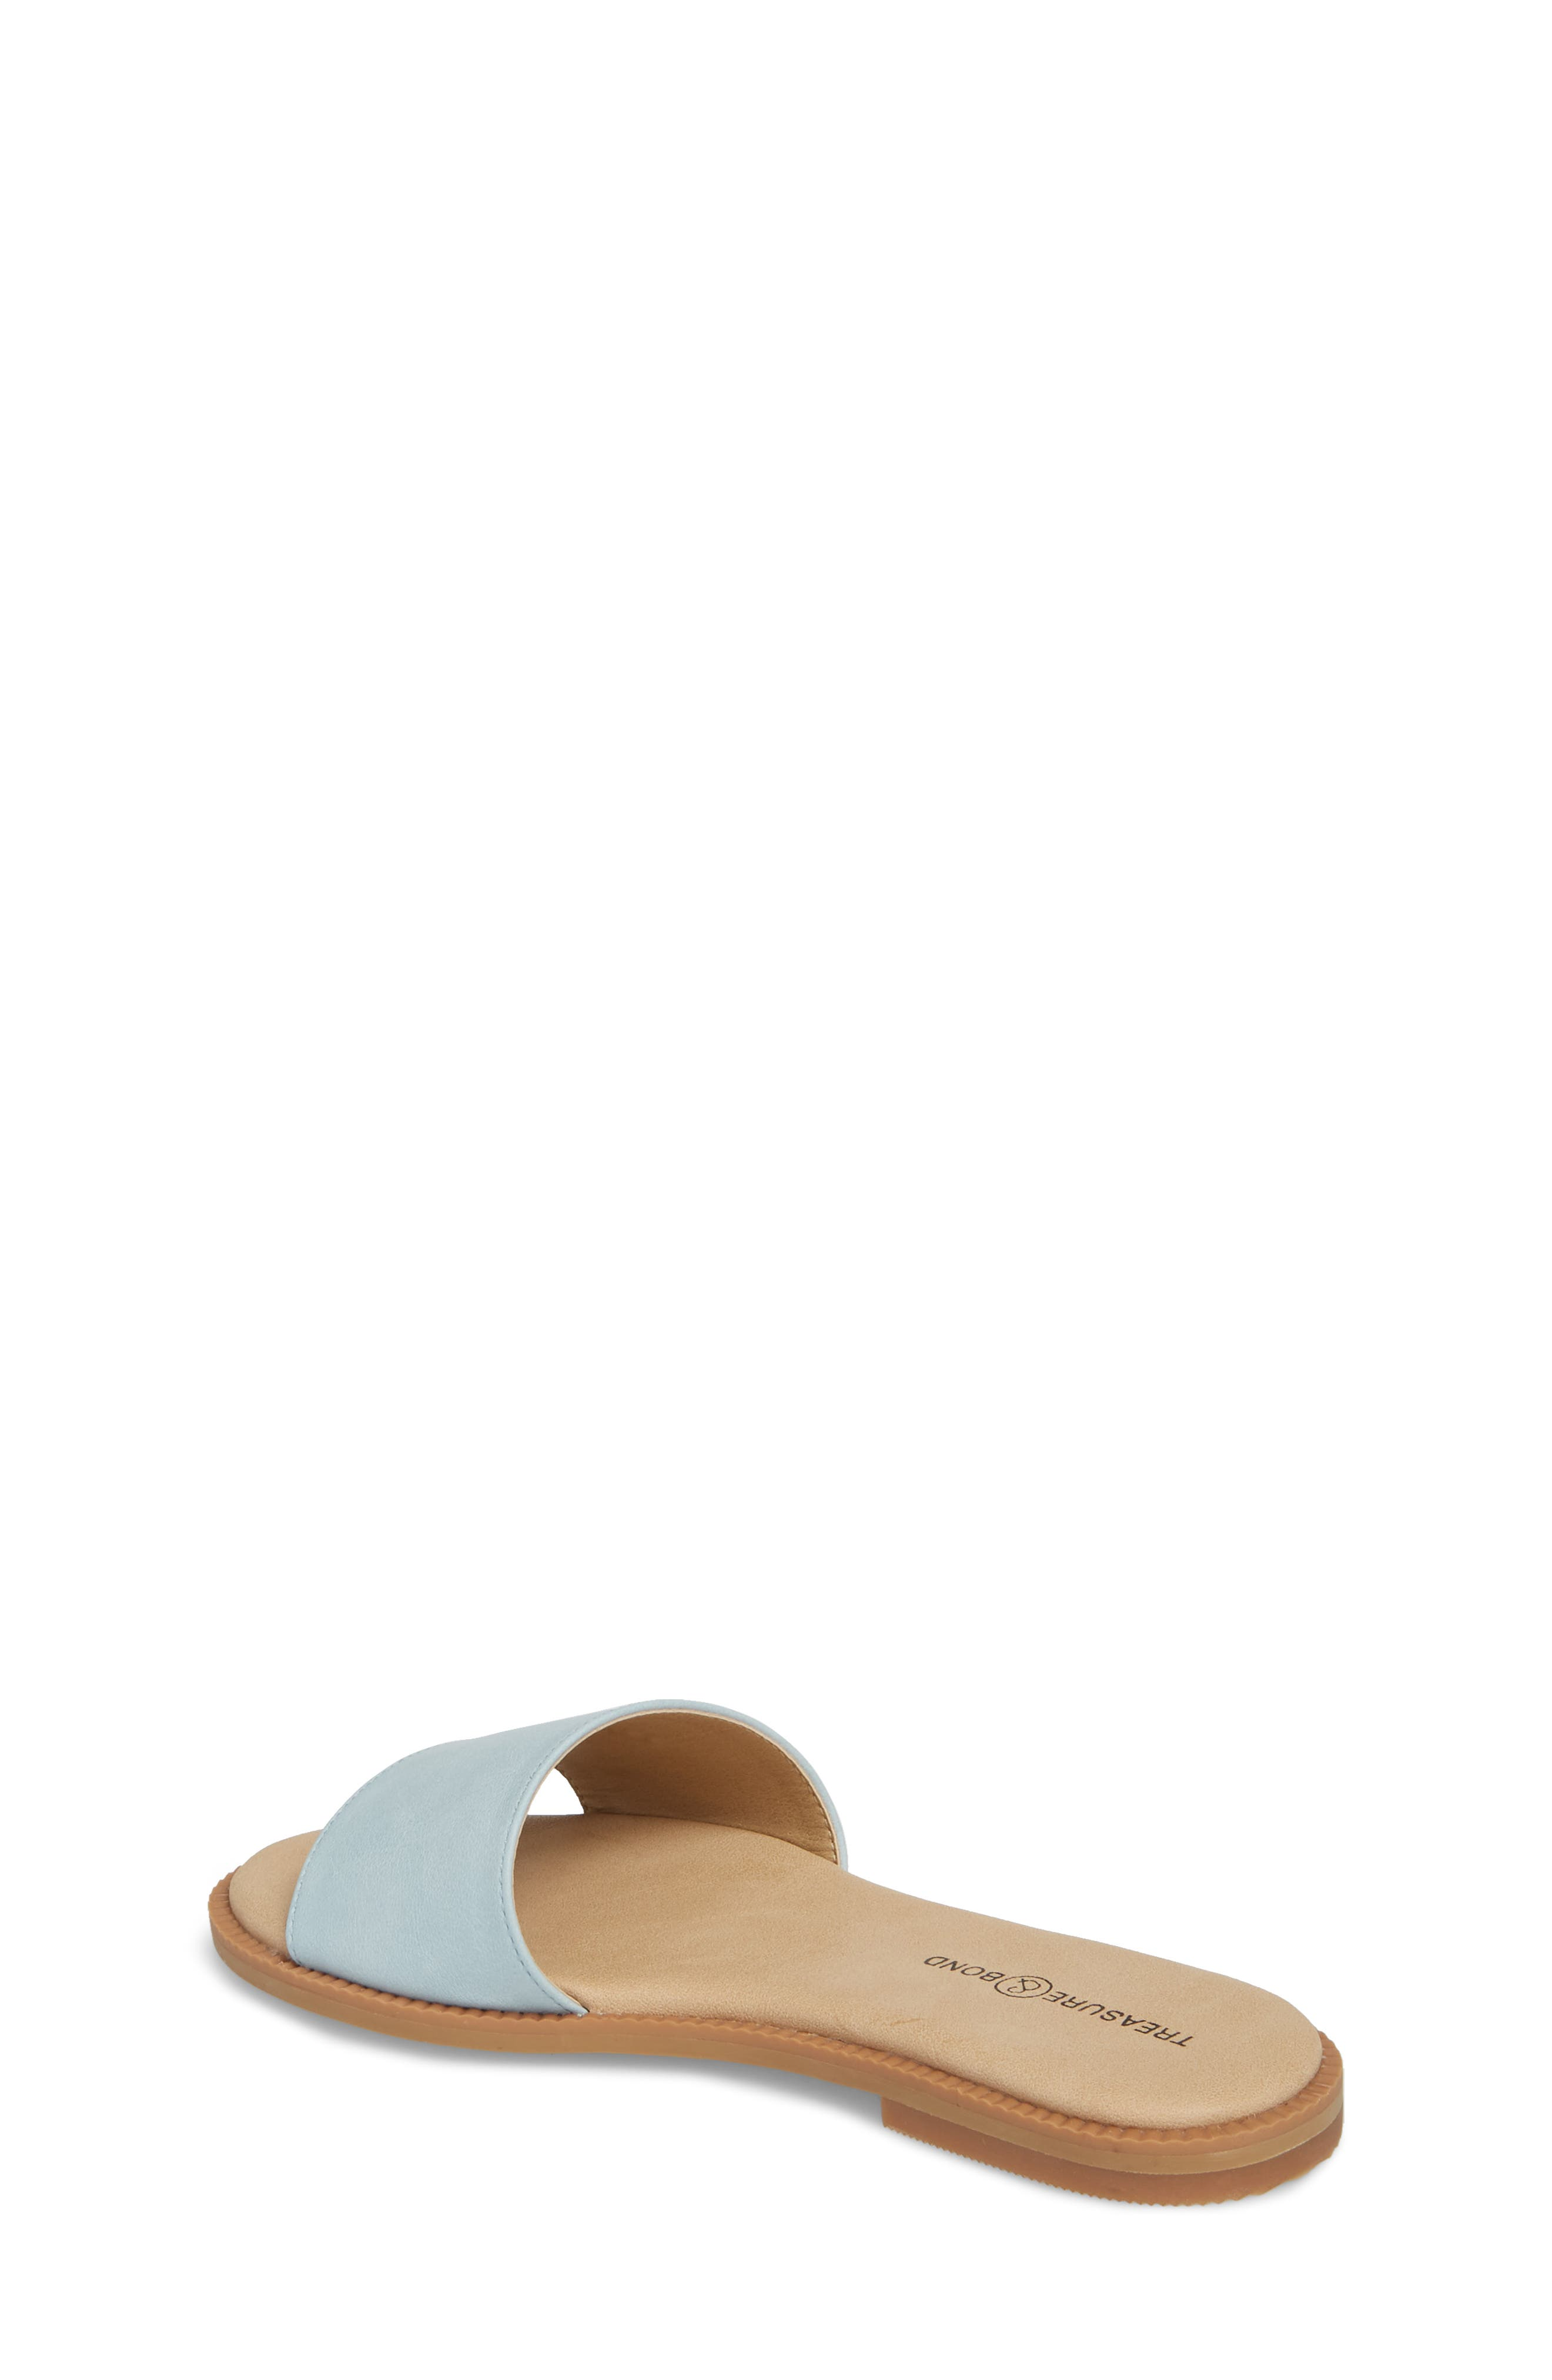 Mia Slide Sandal,                             Alternate thumbnail 2, color,                             Aqua Faux Leather